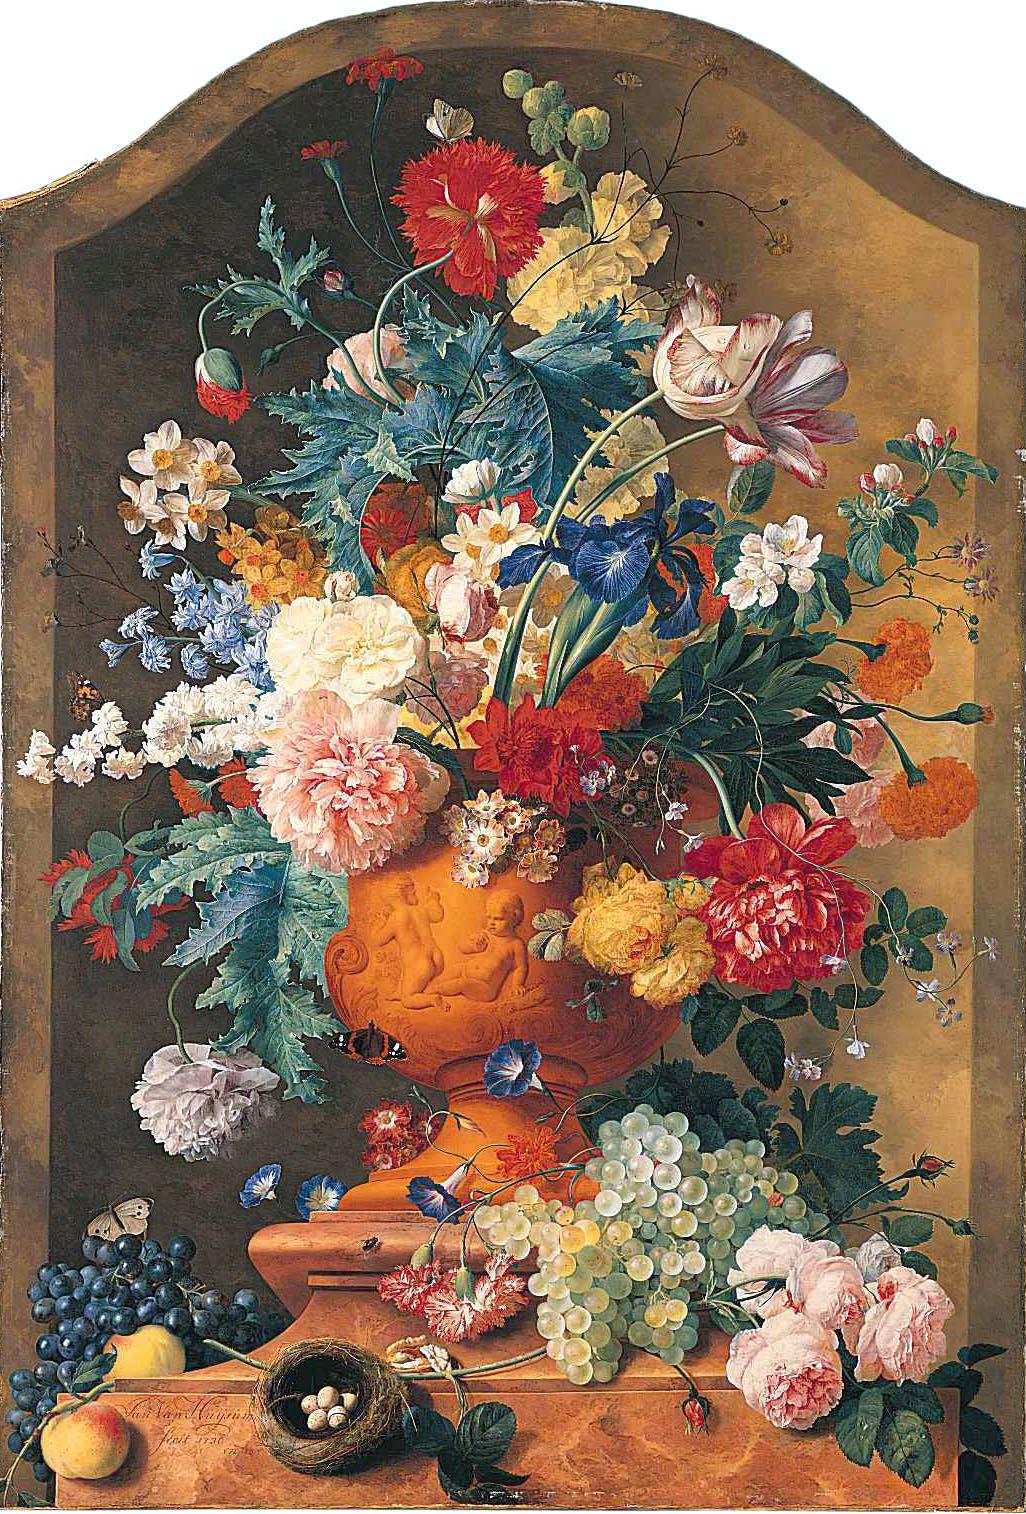 Filejan van huysum flowers in a terracotta vaseg wikimedia filejan van huysum flowers in a terracotta vaseg reviewsmspy